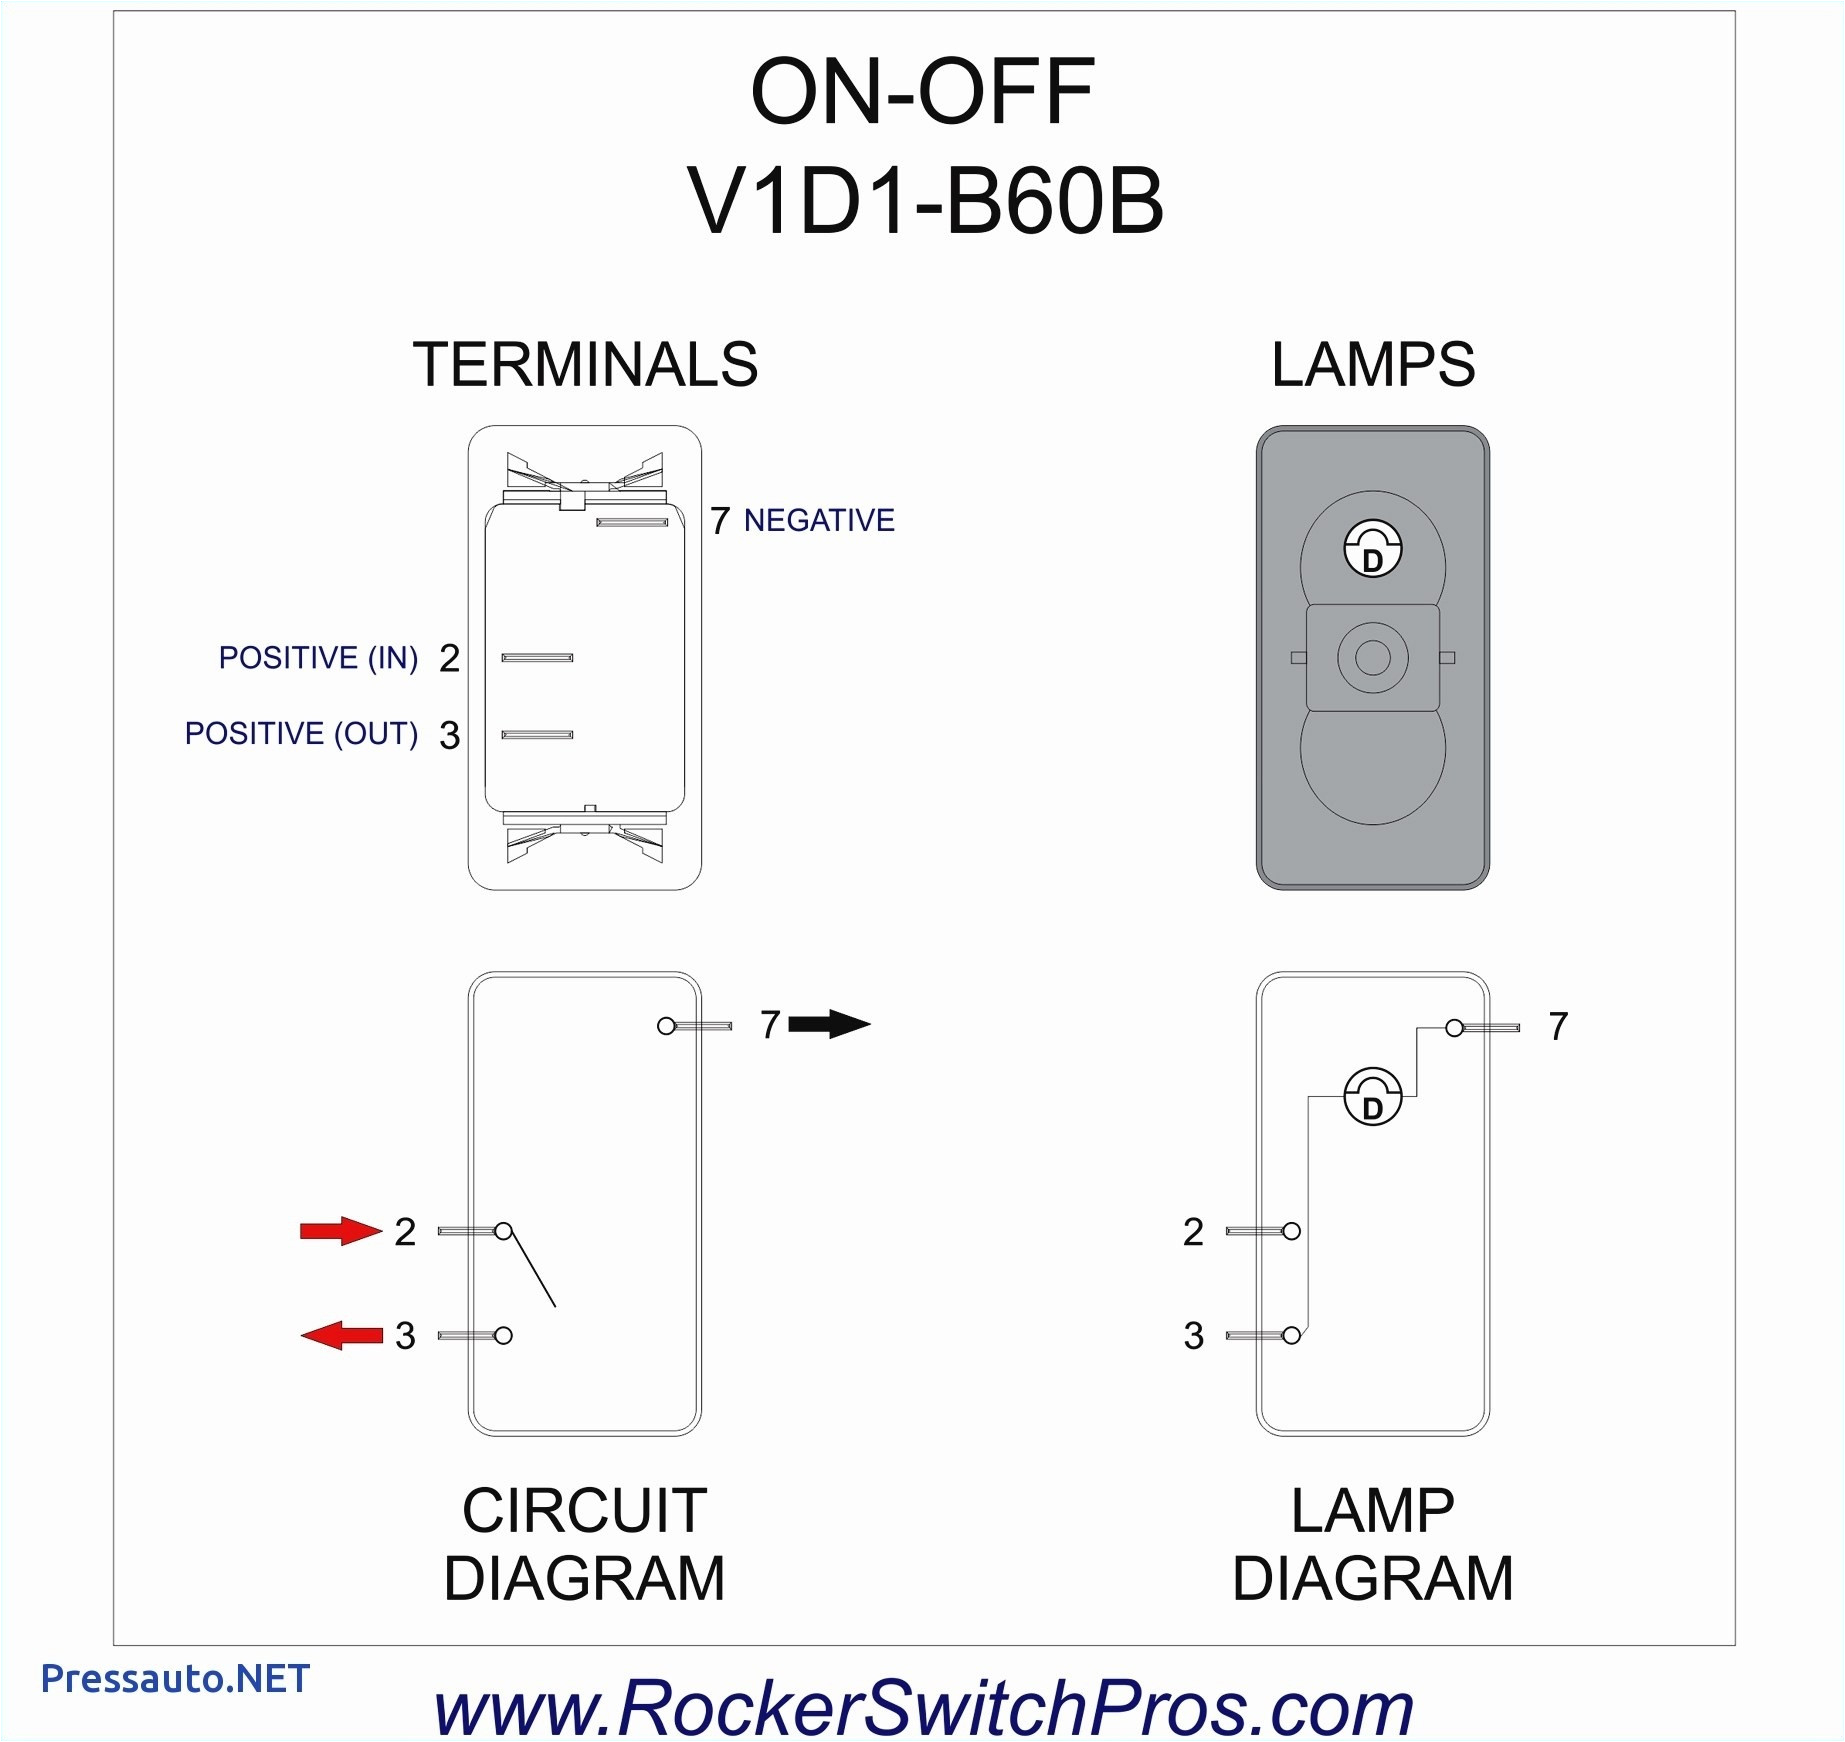 leviton switch wiring diagram fresh light switches with pilot light elegant siemens 3sb3403 0d siemens photos